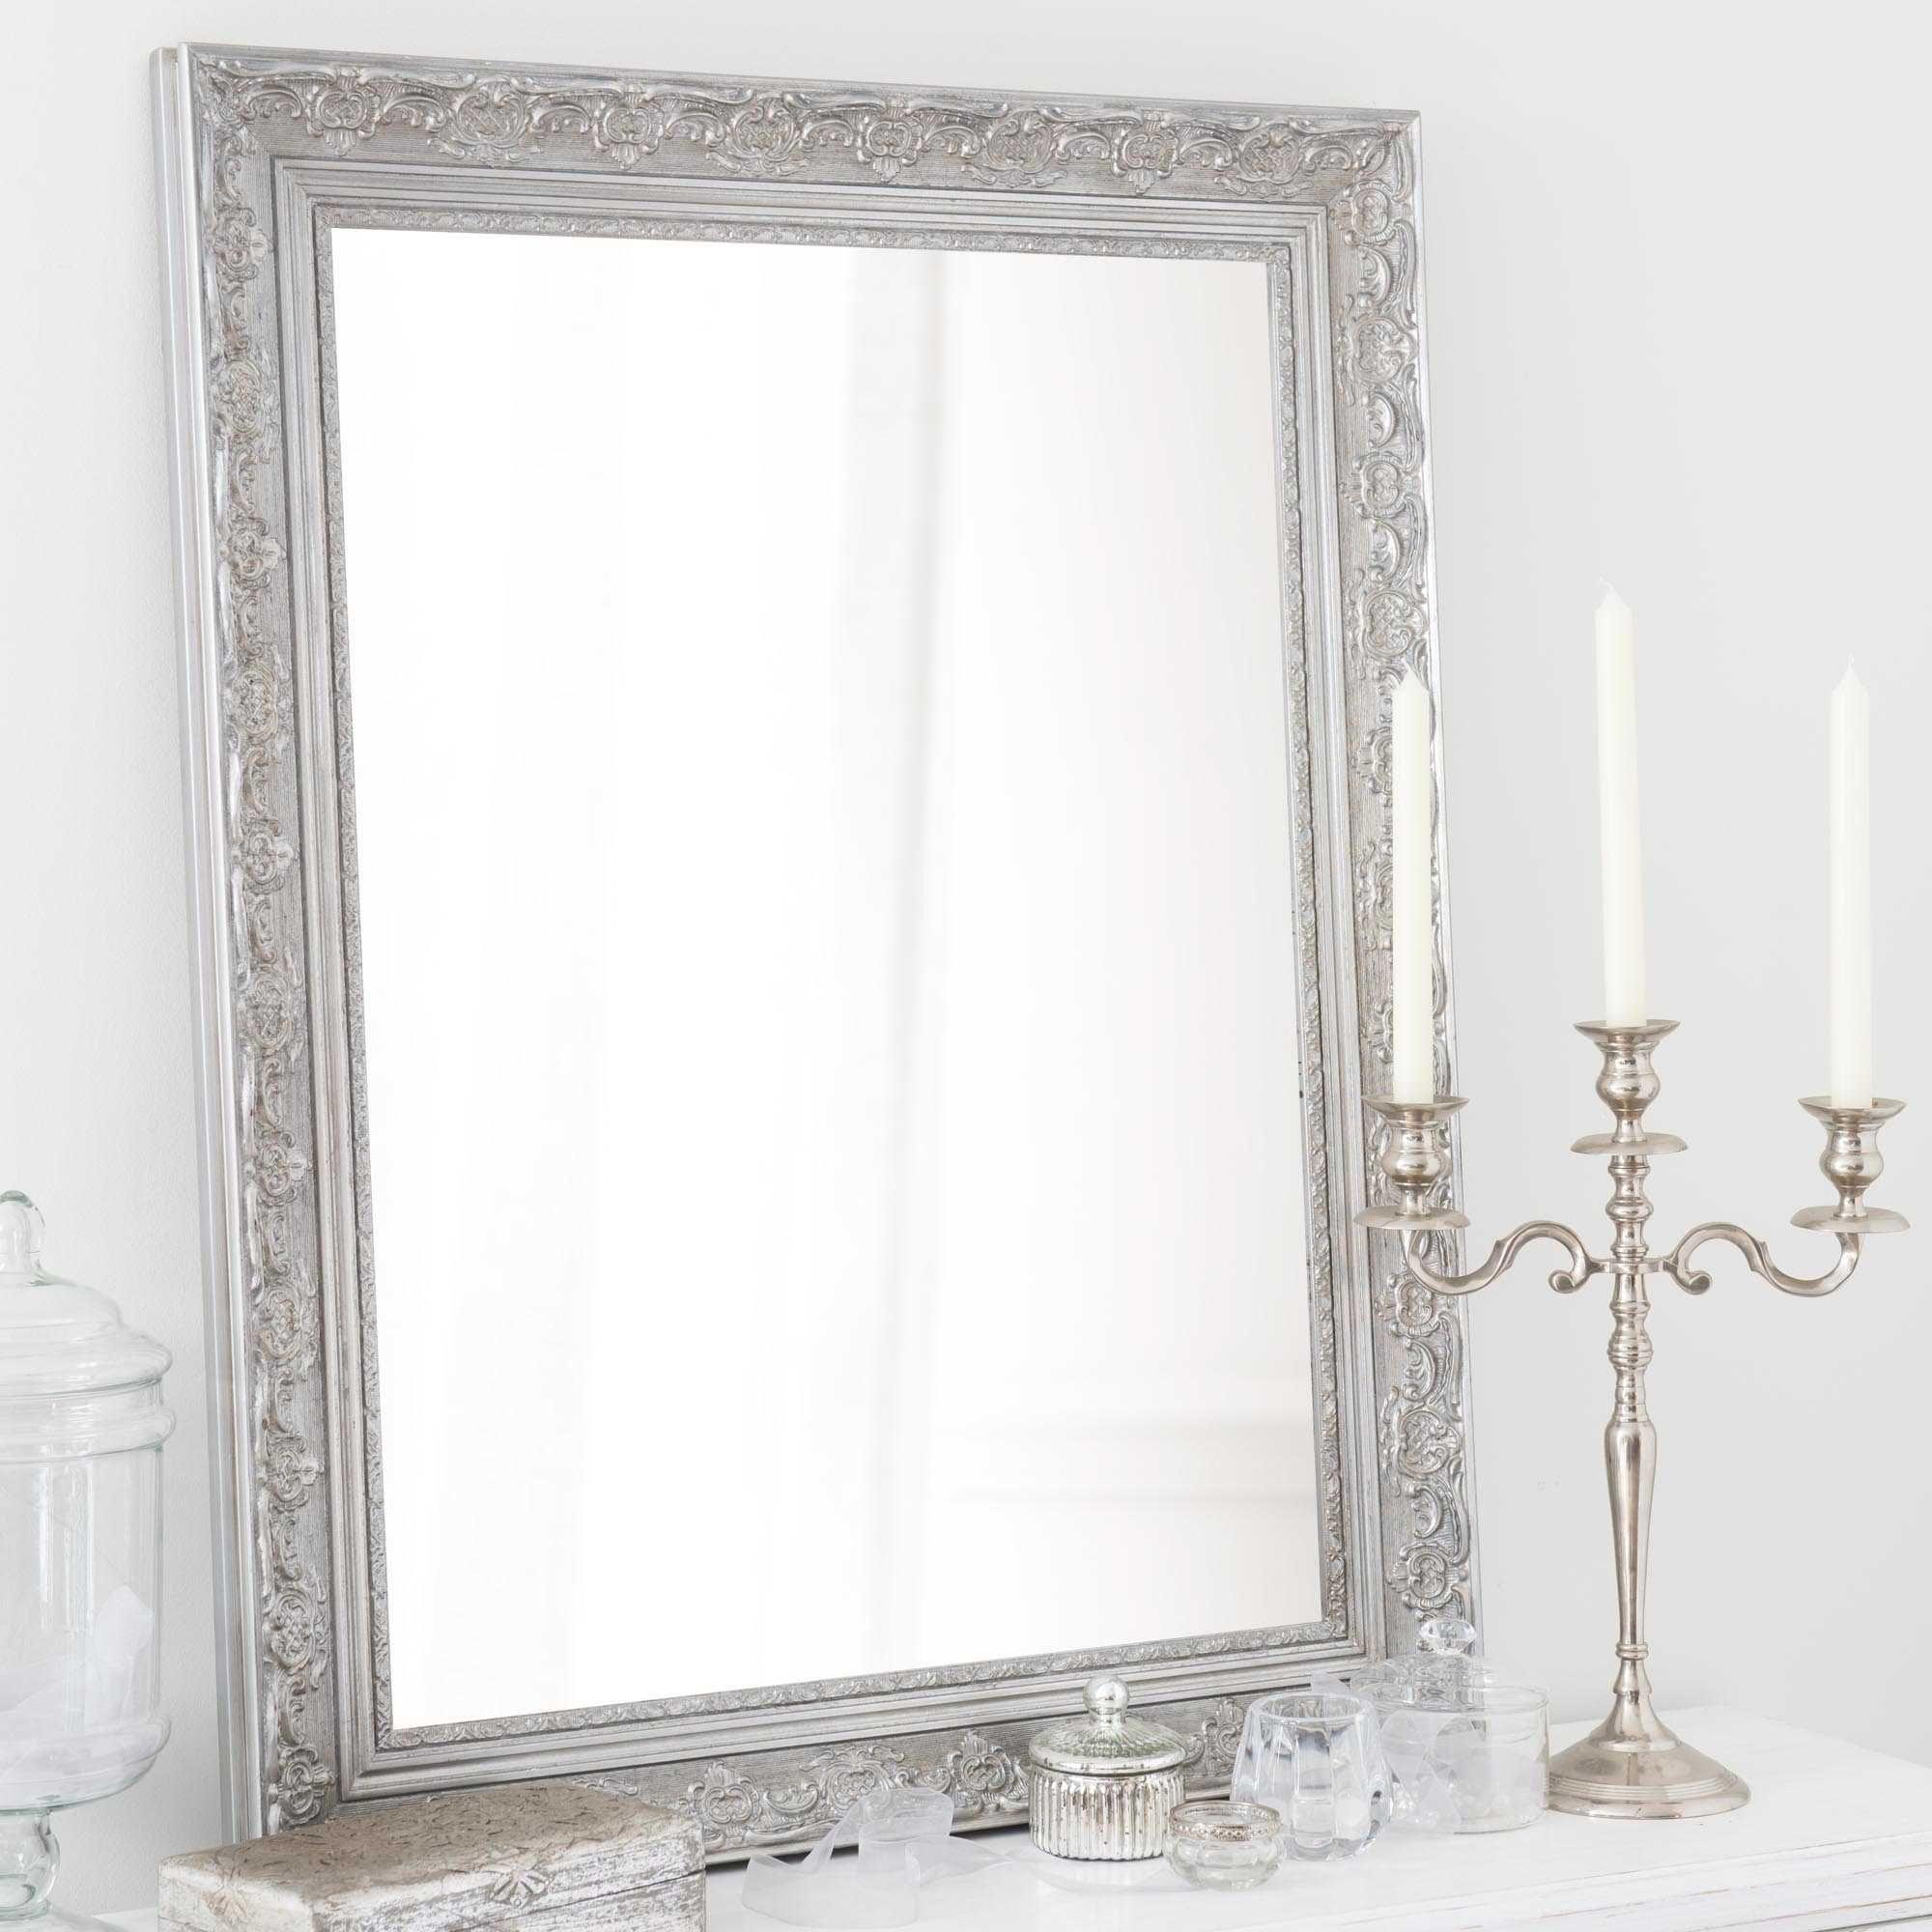 Espejo de madera de paulonia plateado Al. 90 cm